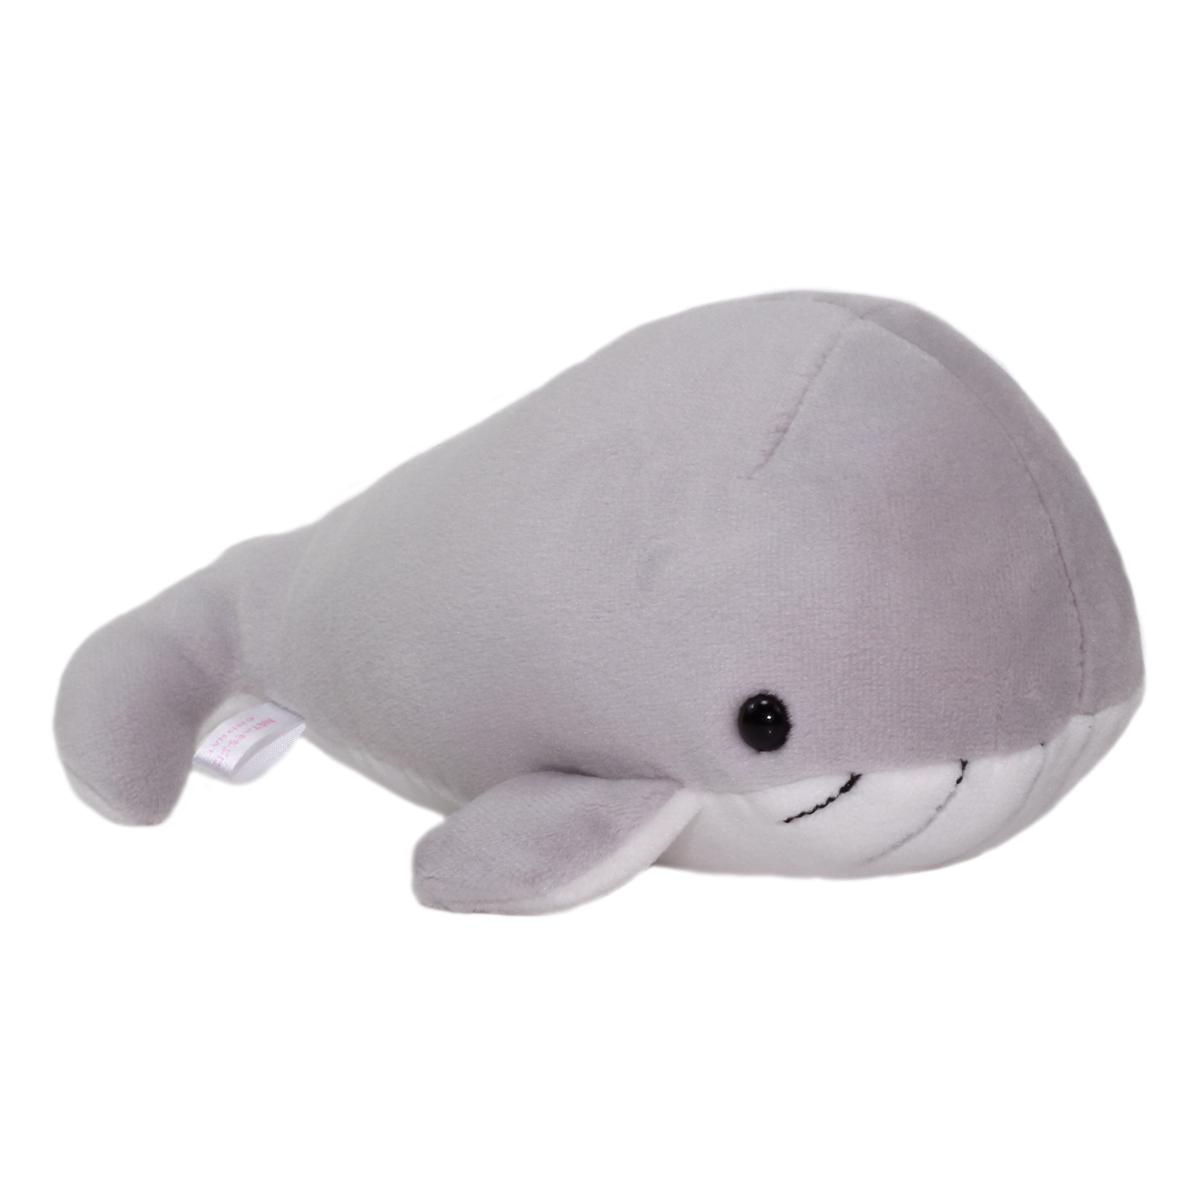 Aquarium Collection Plush Whale Plush Toy Super Soft Stuffed Animal Grey/White Kuzira